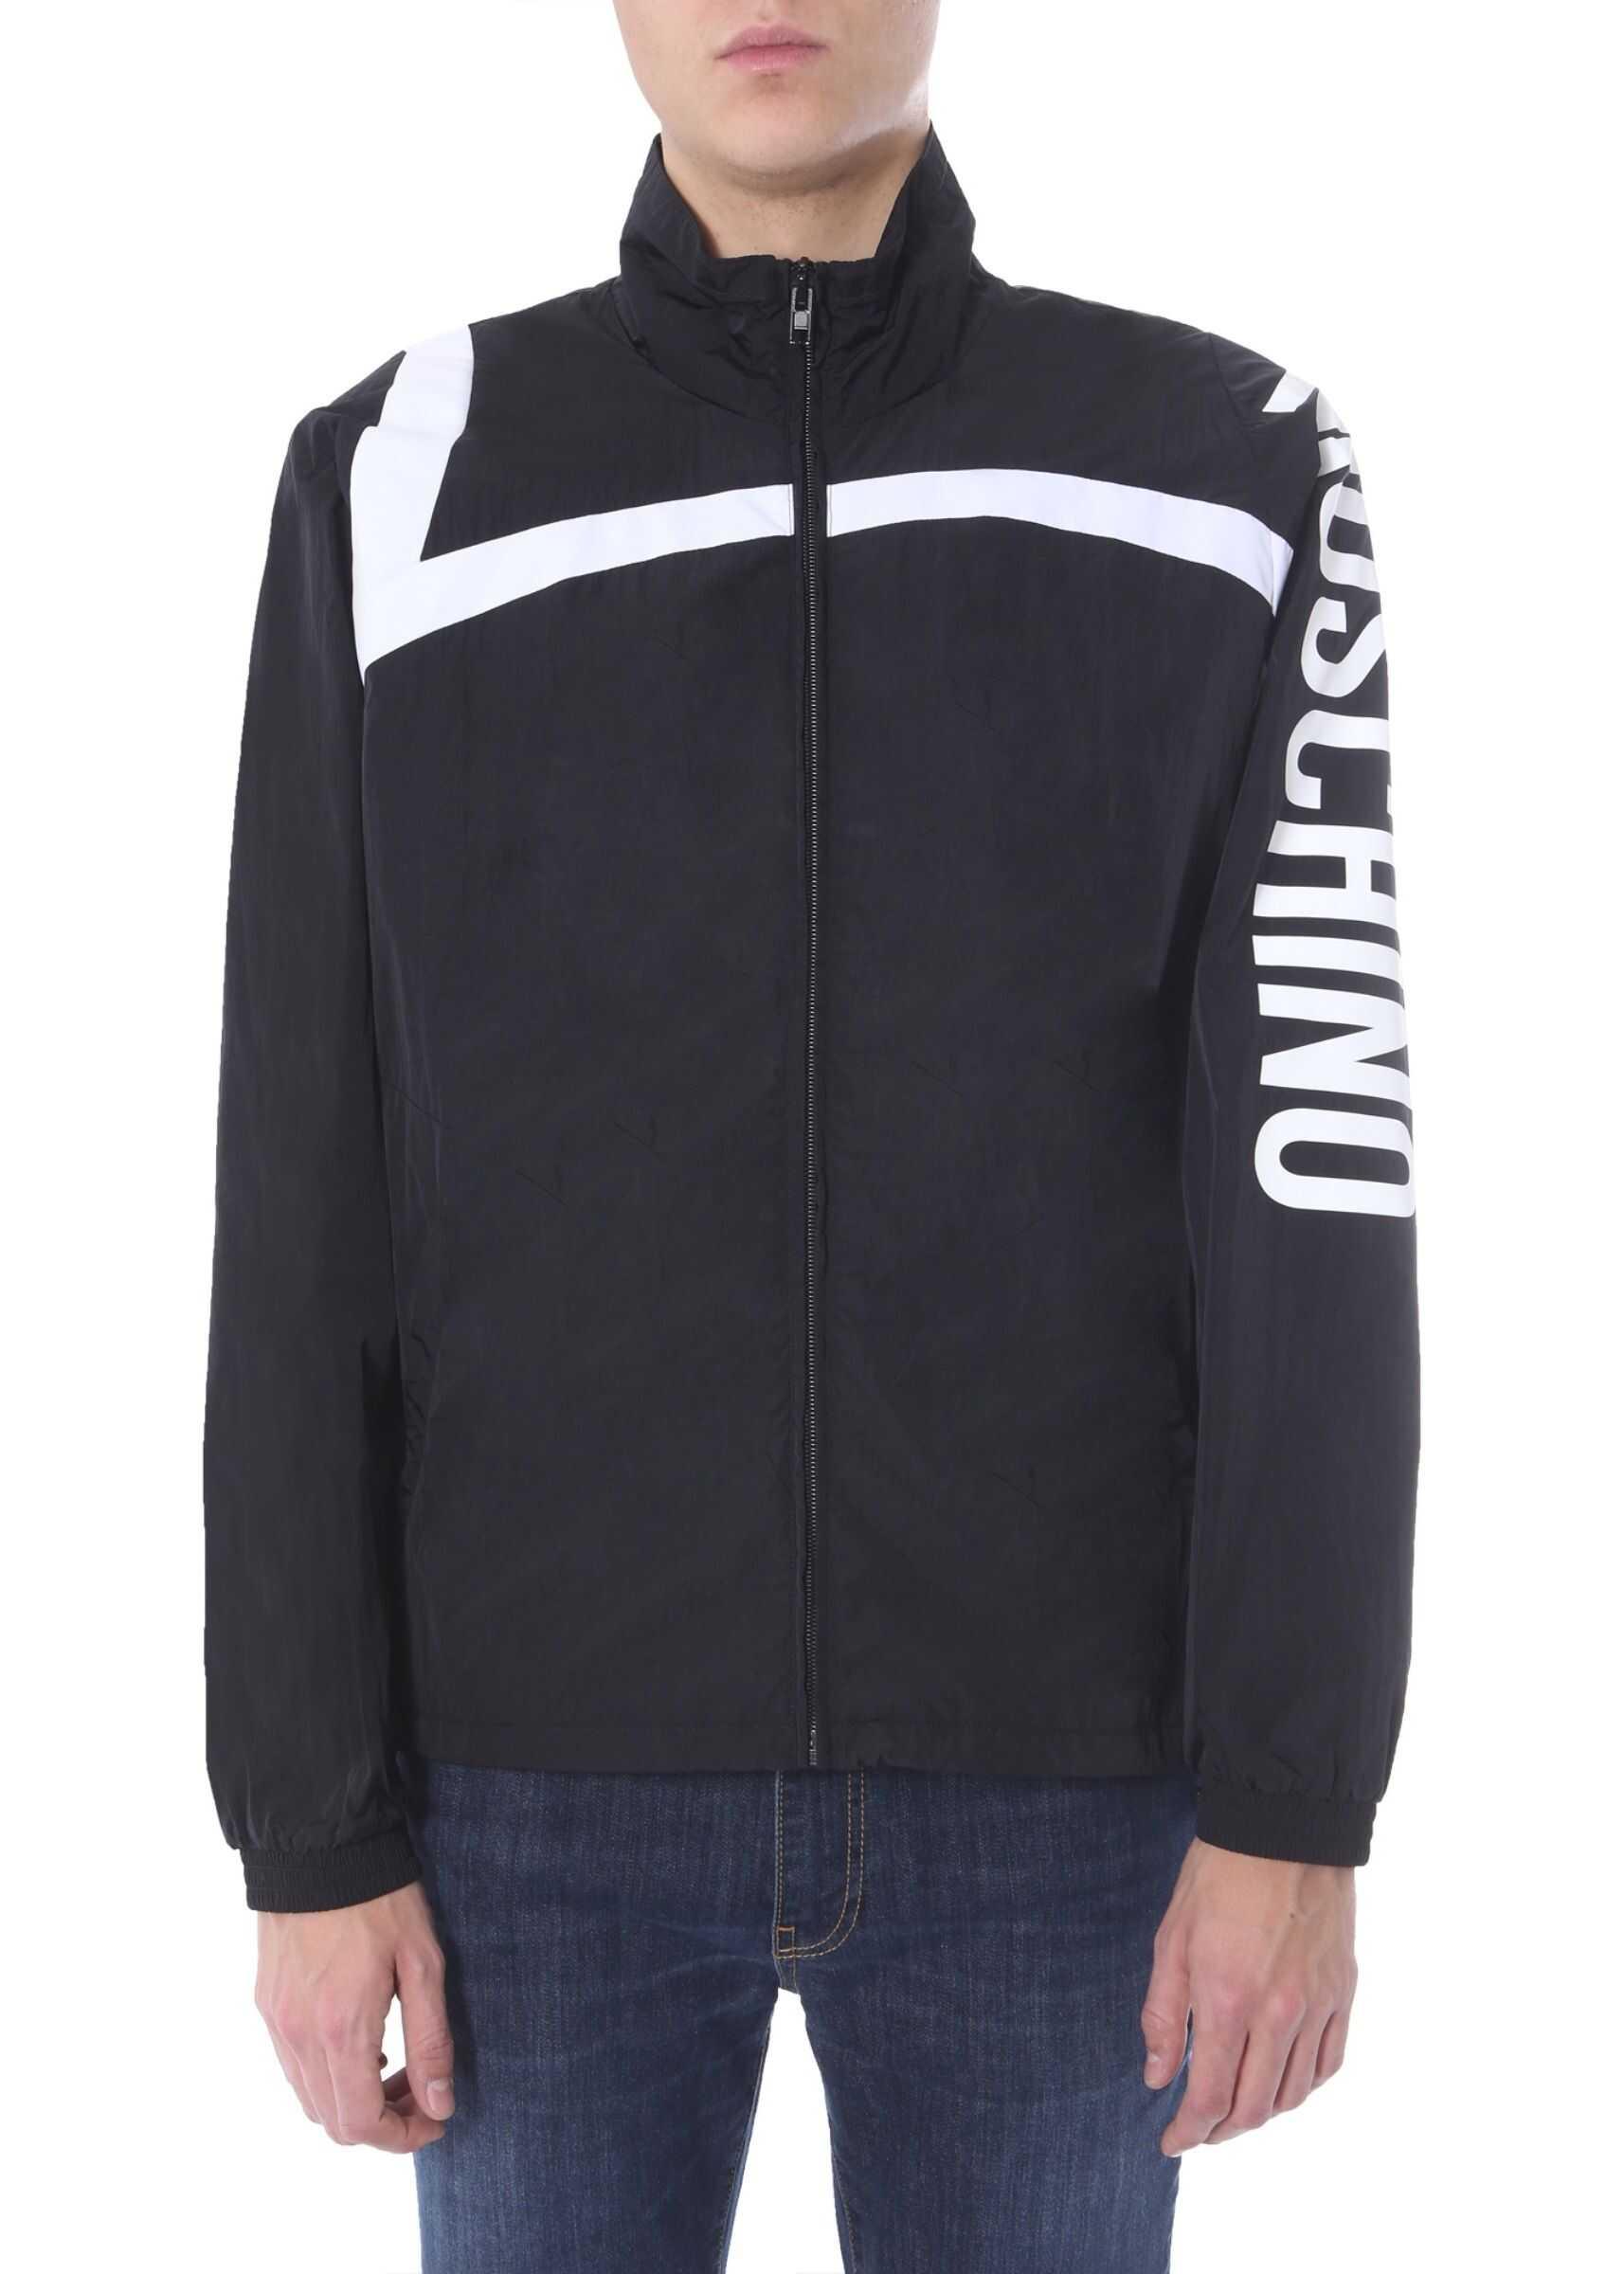 Moschino Jacket With Print BLACK imagine